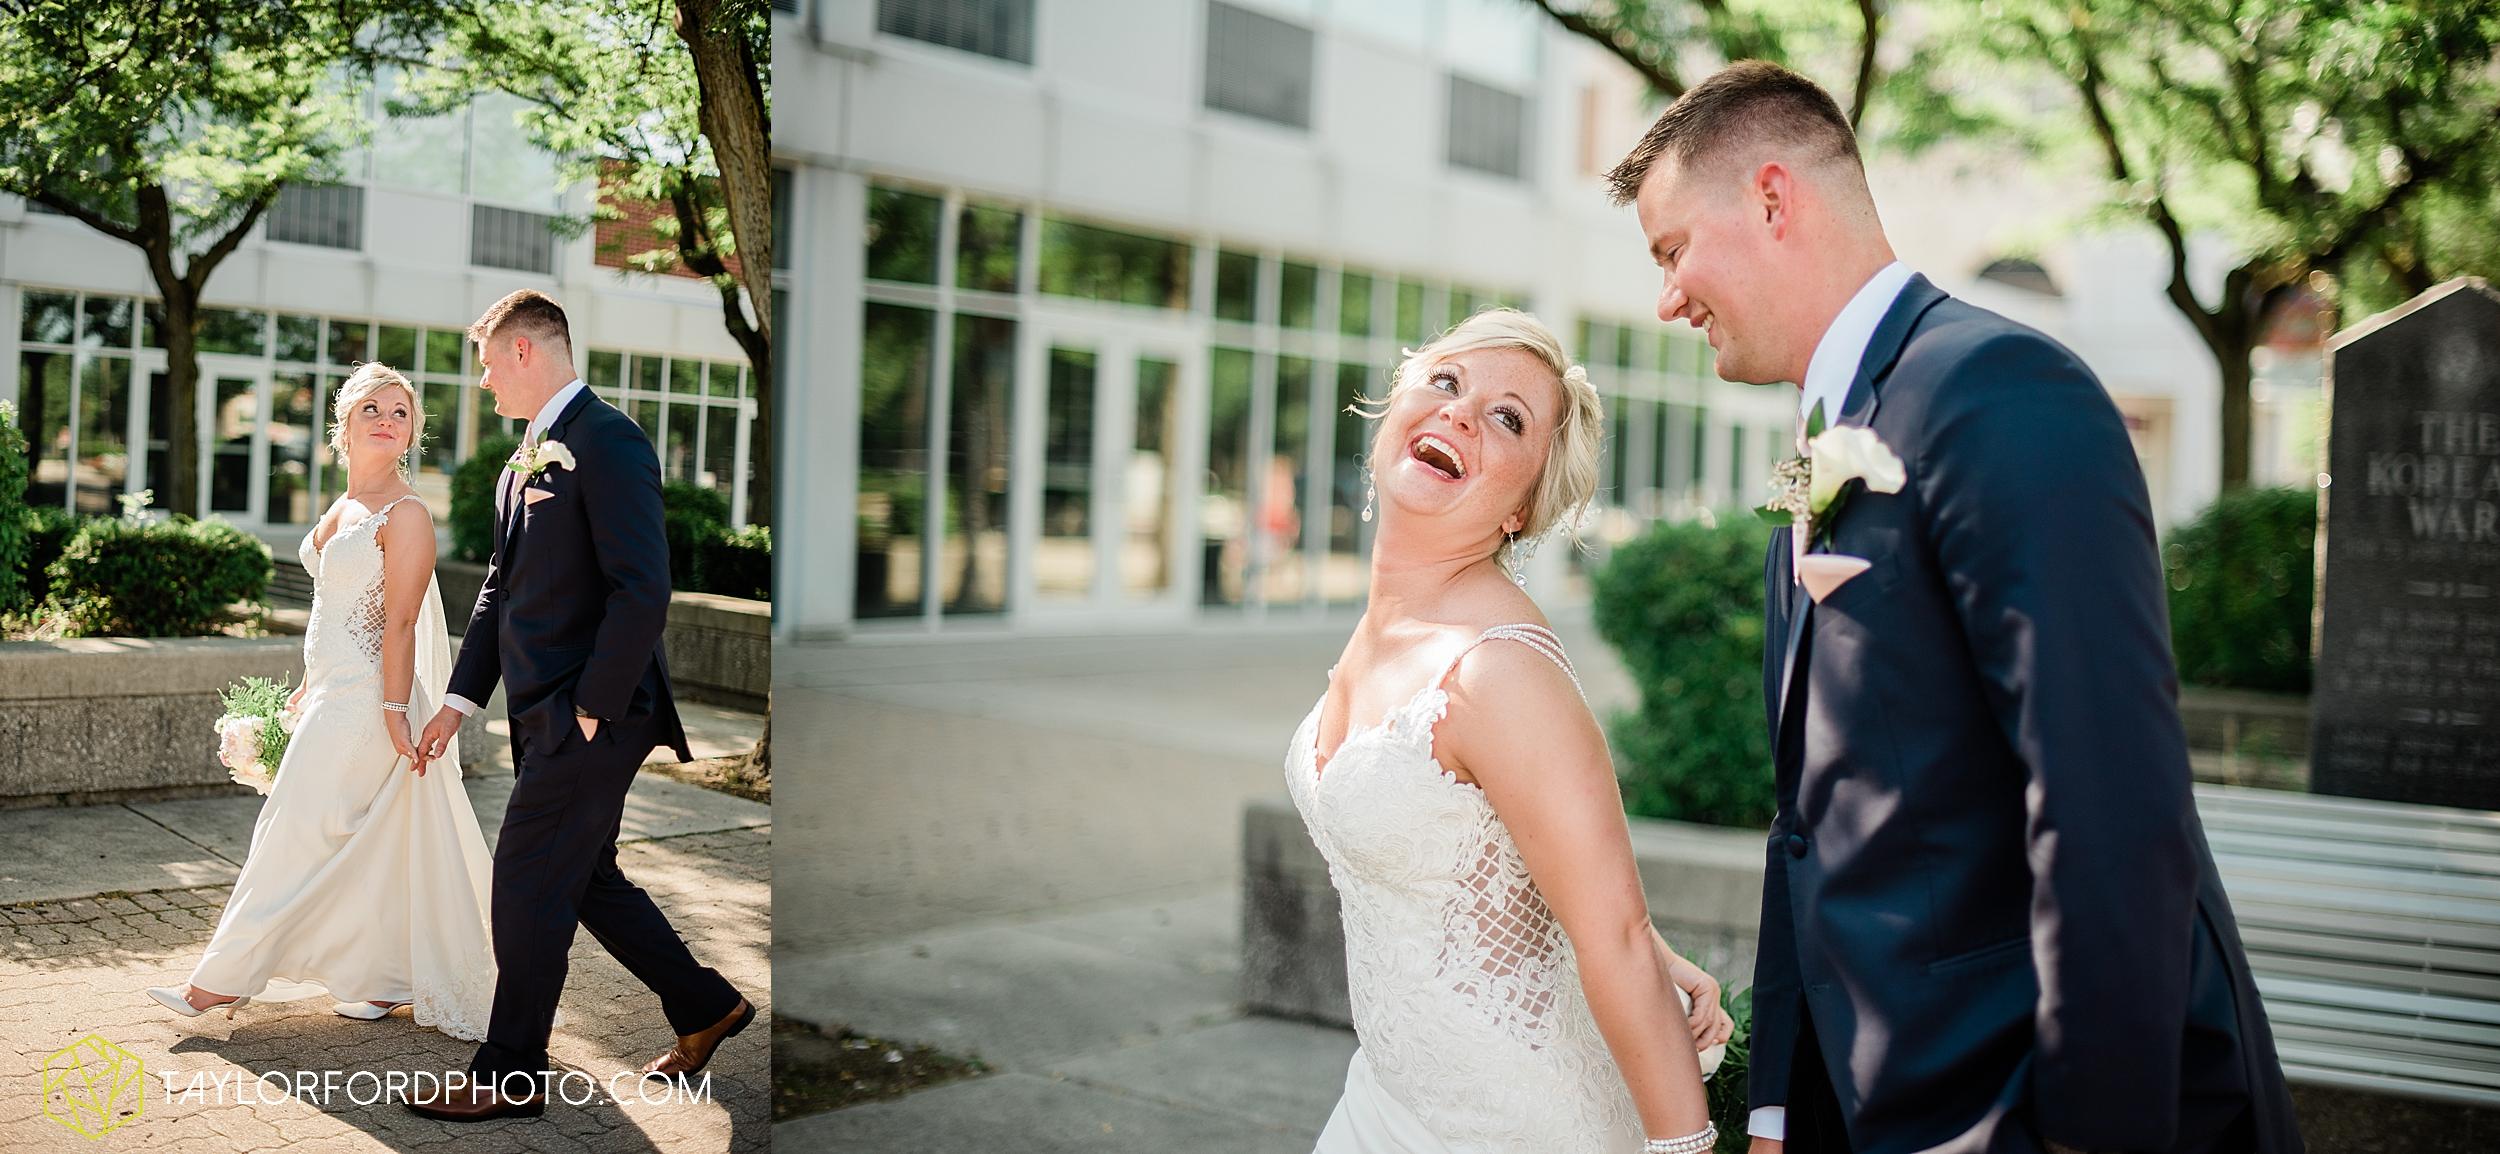 carly-trent-lima-elida-ohio-wedding-the-met-civic-center-reception-immanuel-united-methodist-church-photography-taylor-ford-hirschy-photographer_3369.jpg